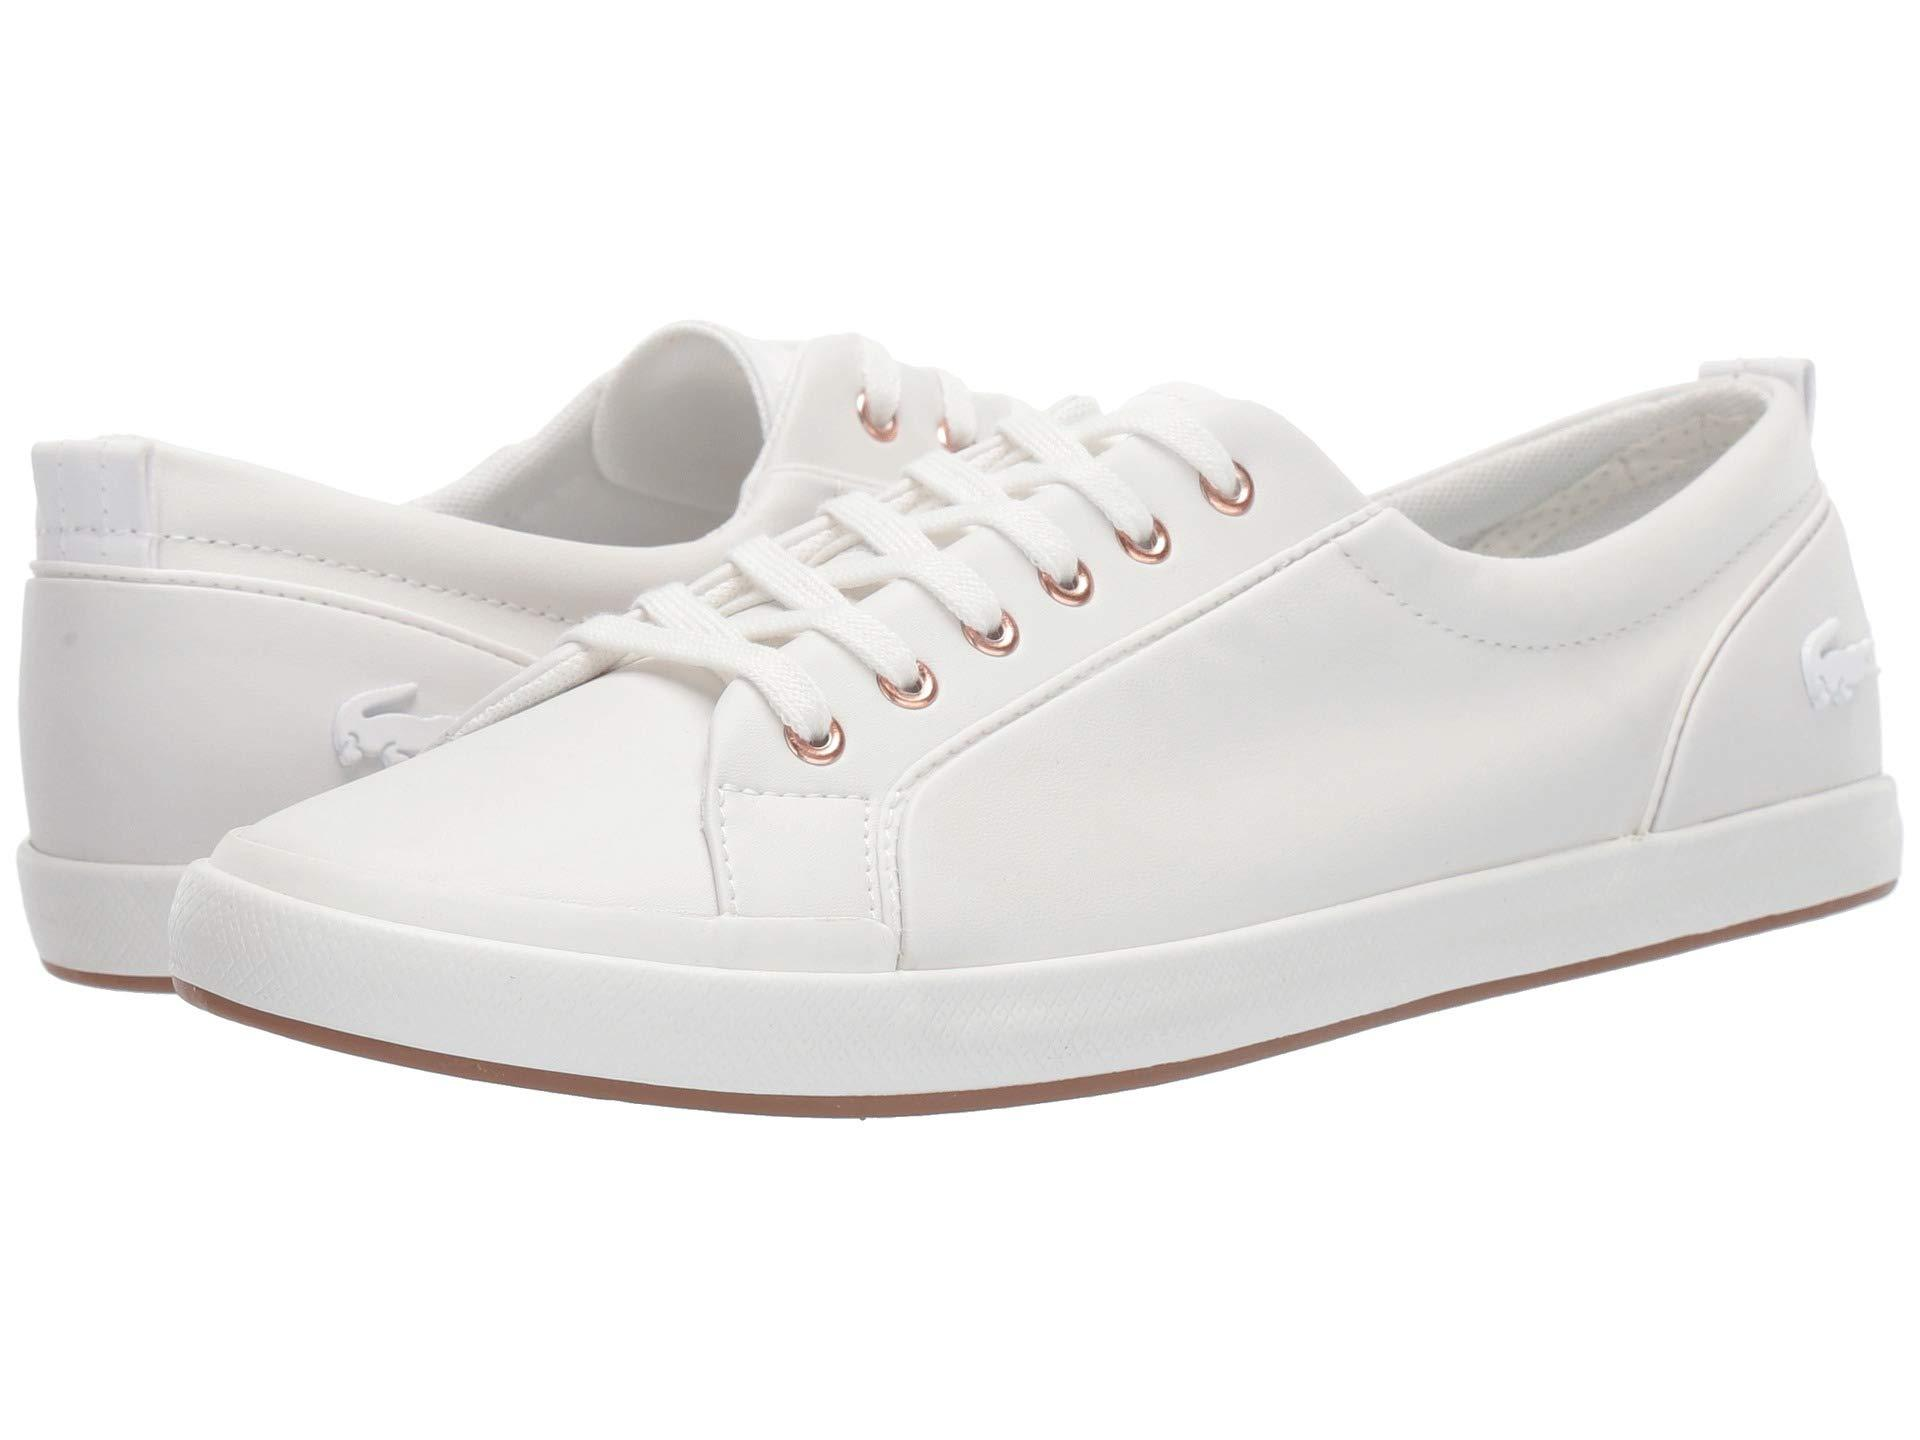 Lacoste Leather Lancelle Sneaker 319 2